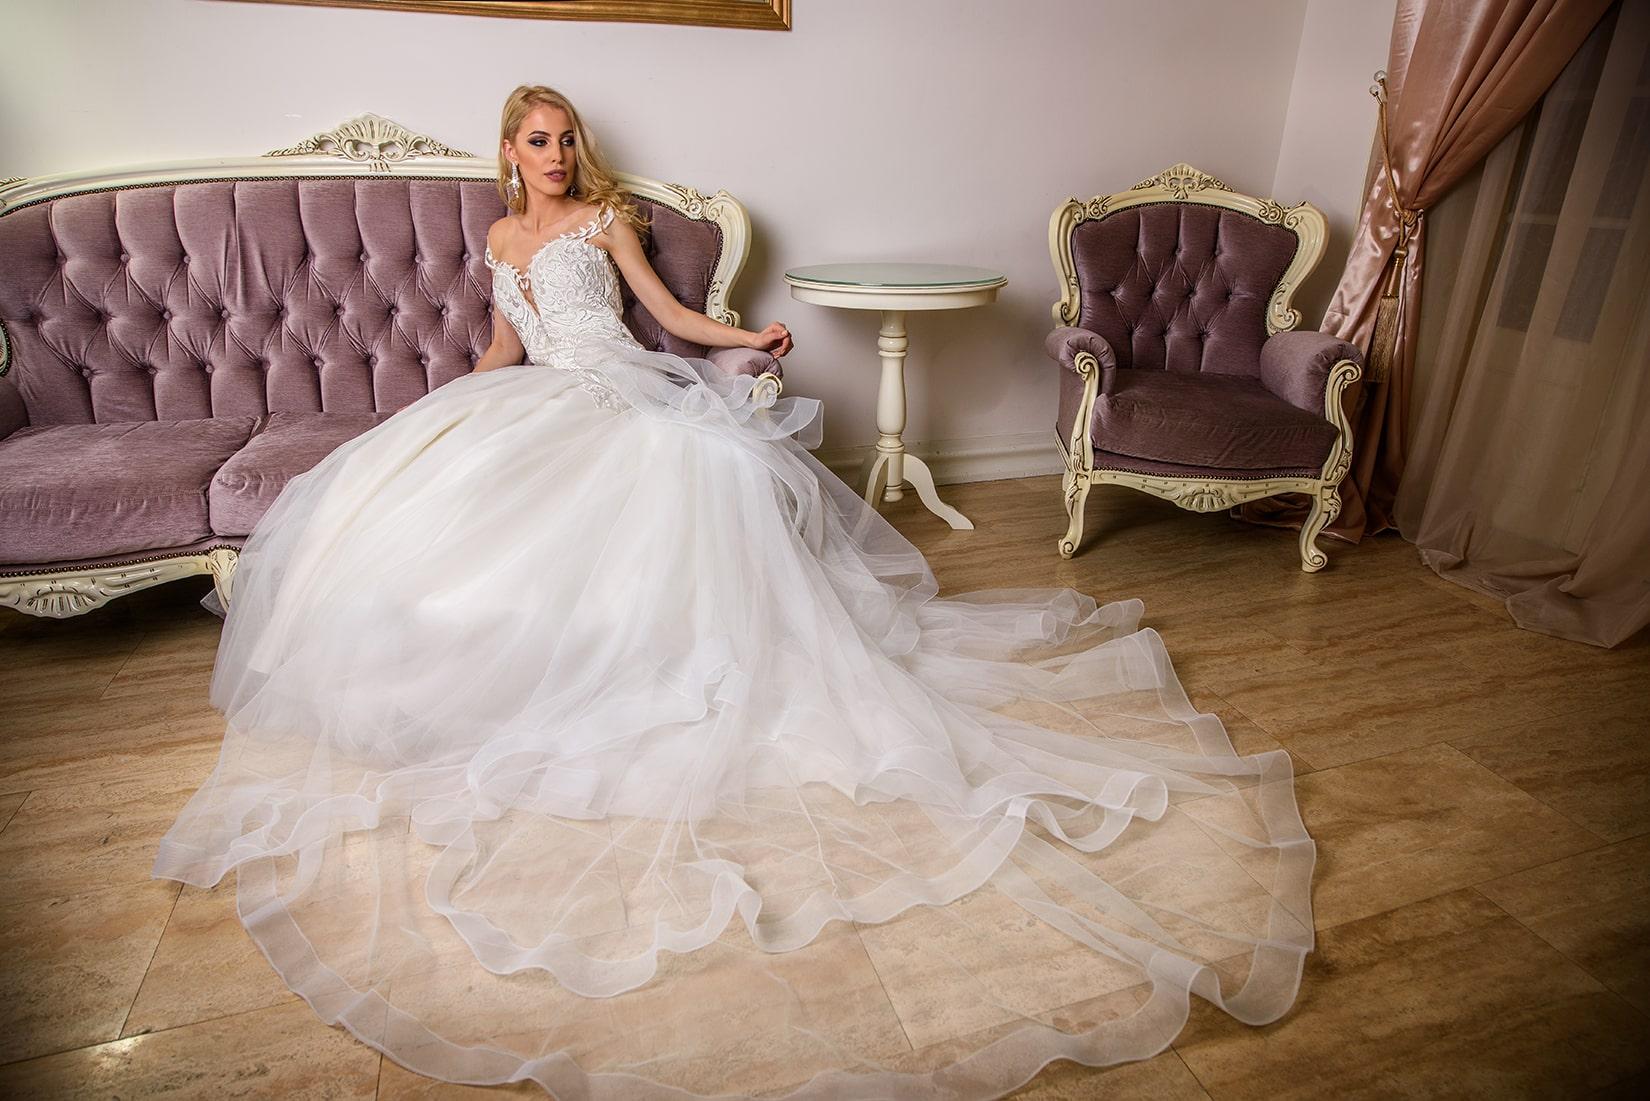 Noelle Model - Colectia Baroque - Adora Sposa (4)